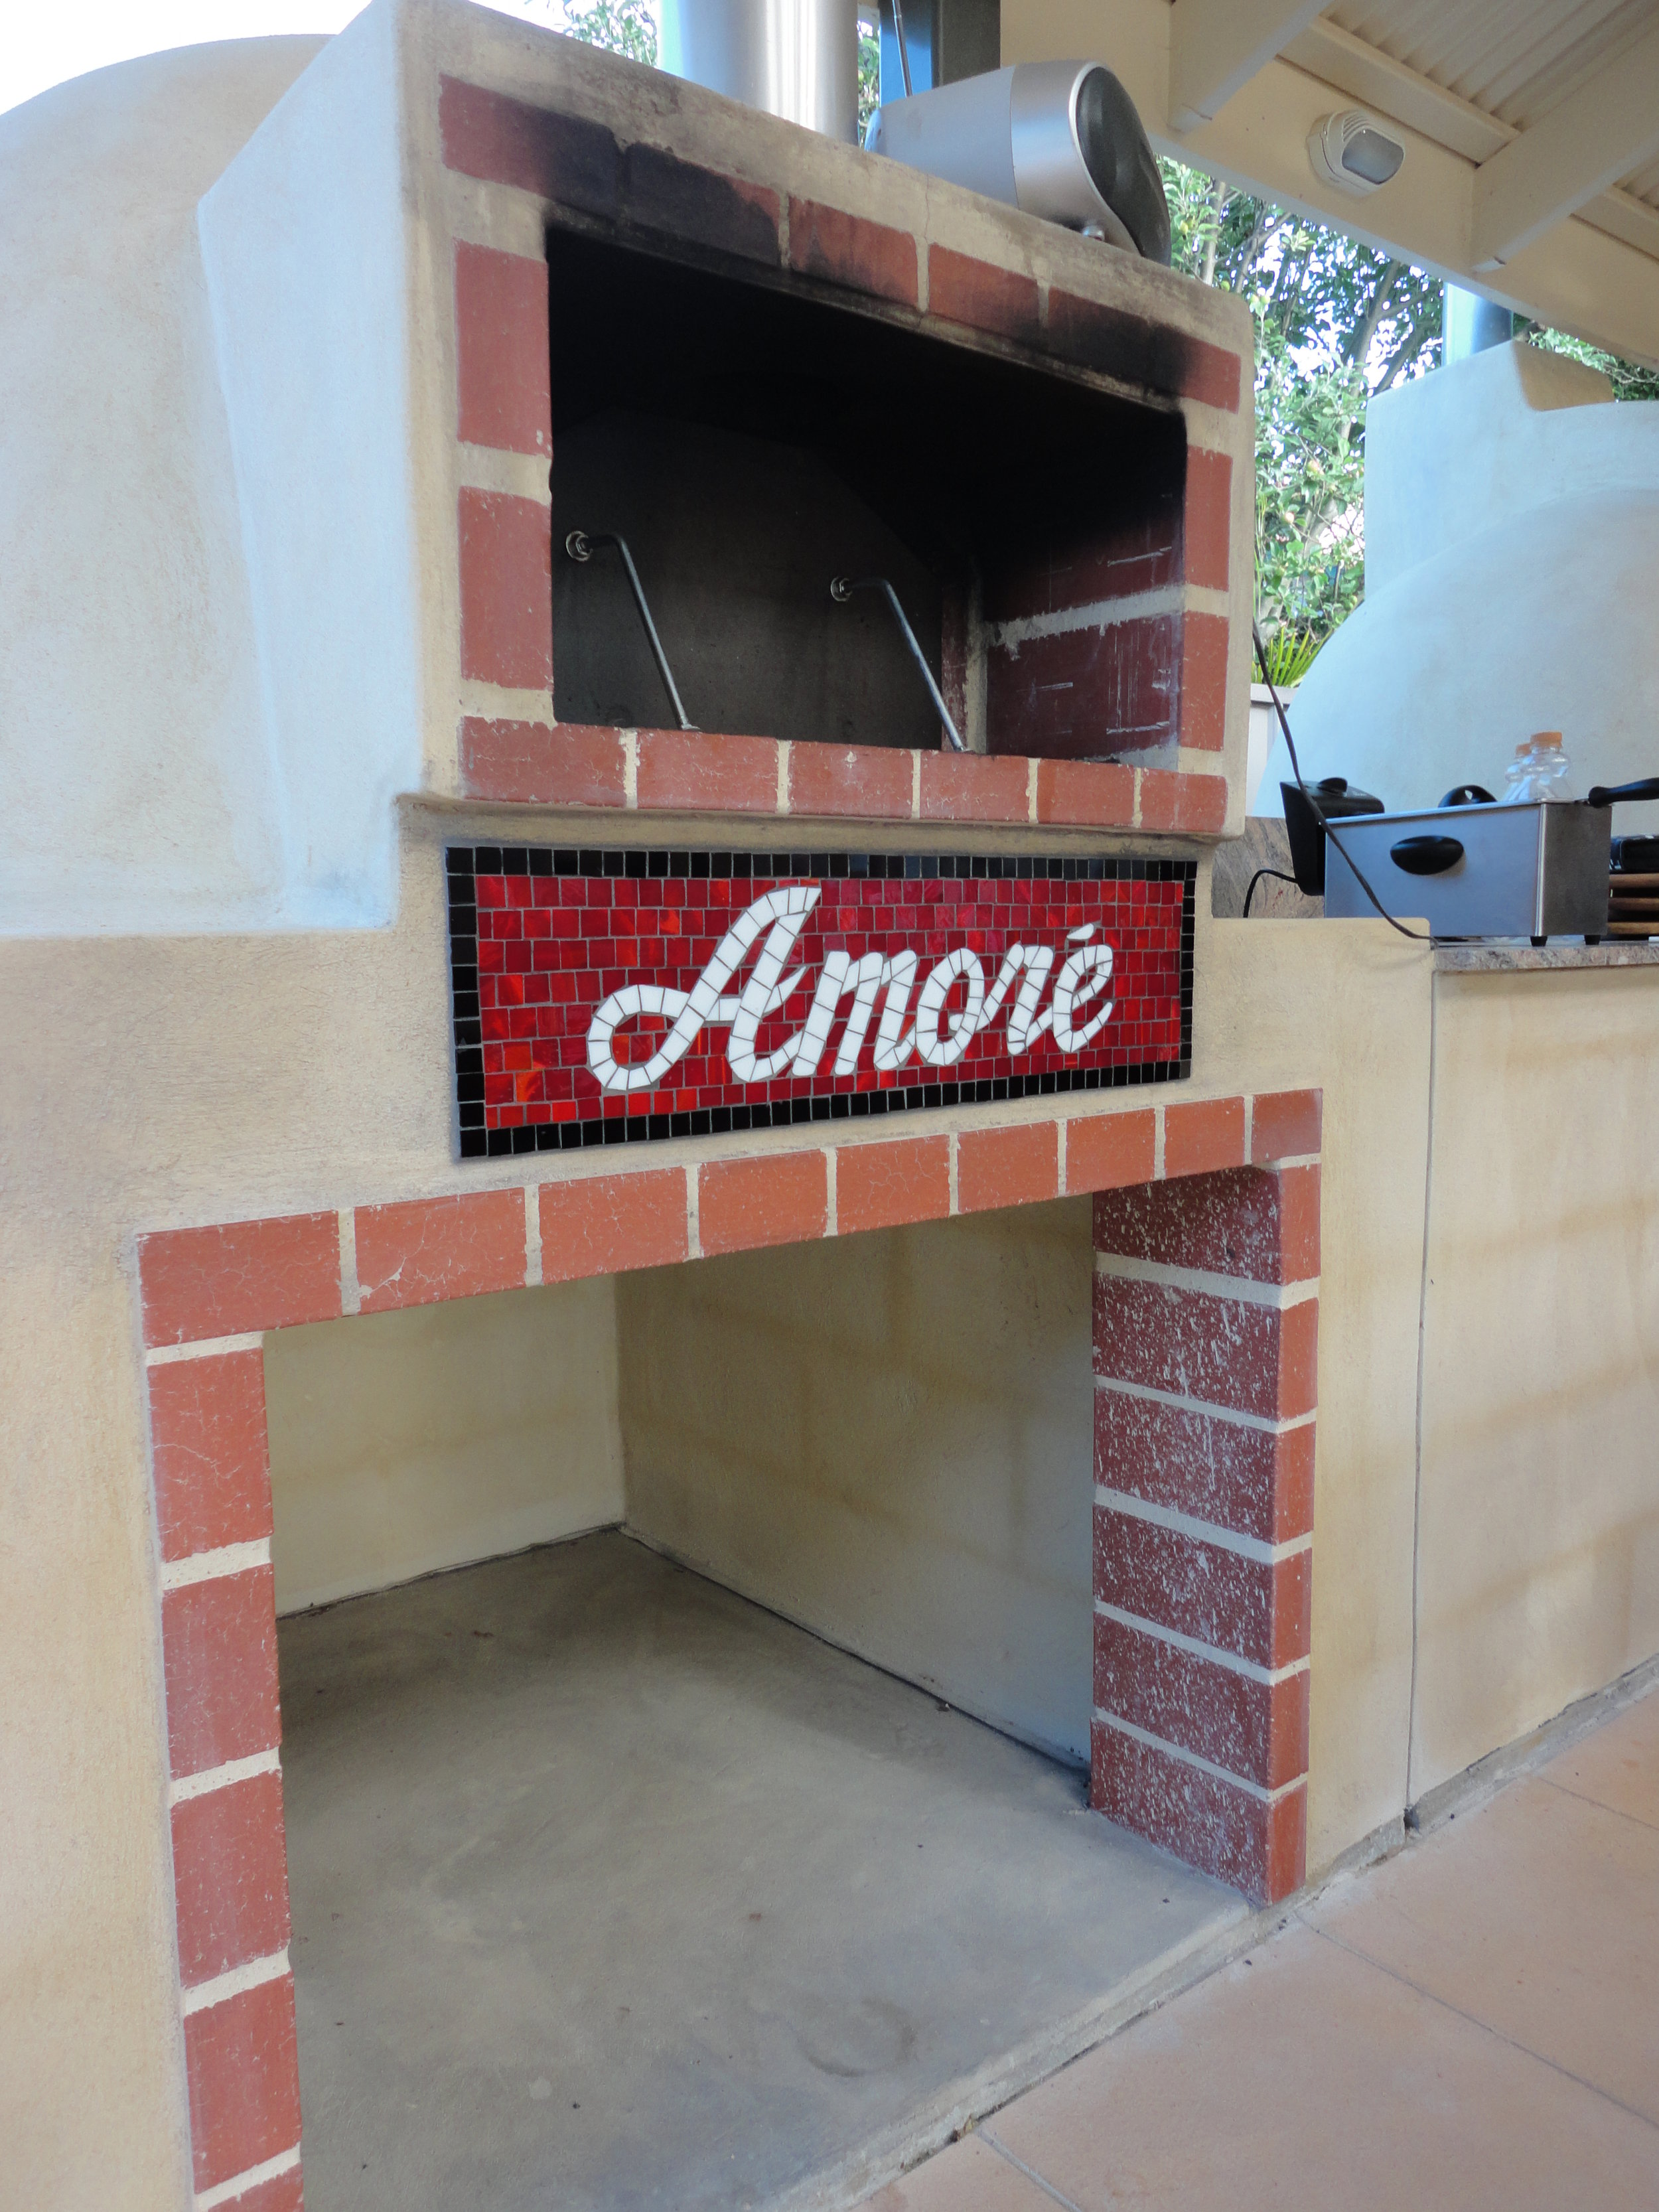 Amore' Wood Ovens (Commission)